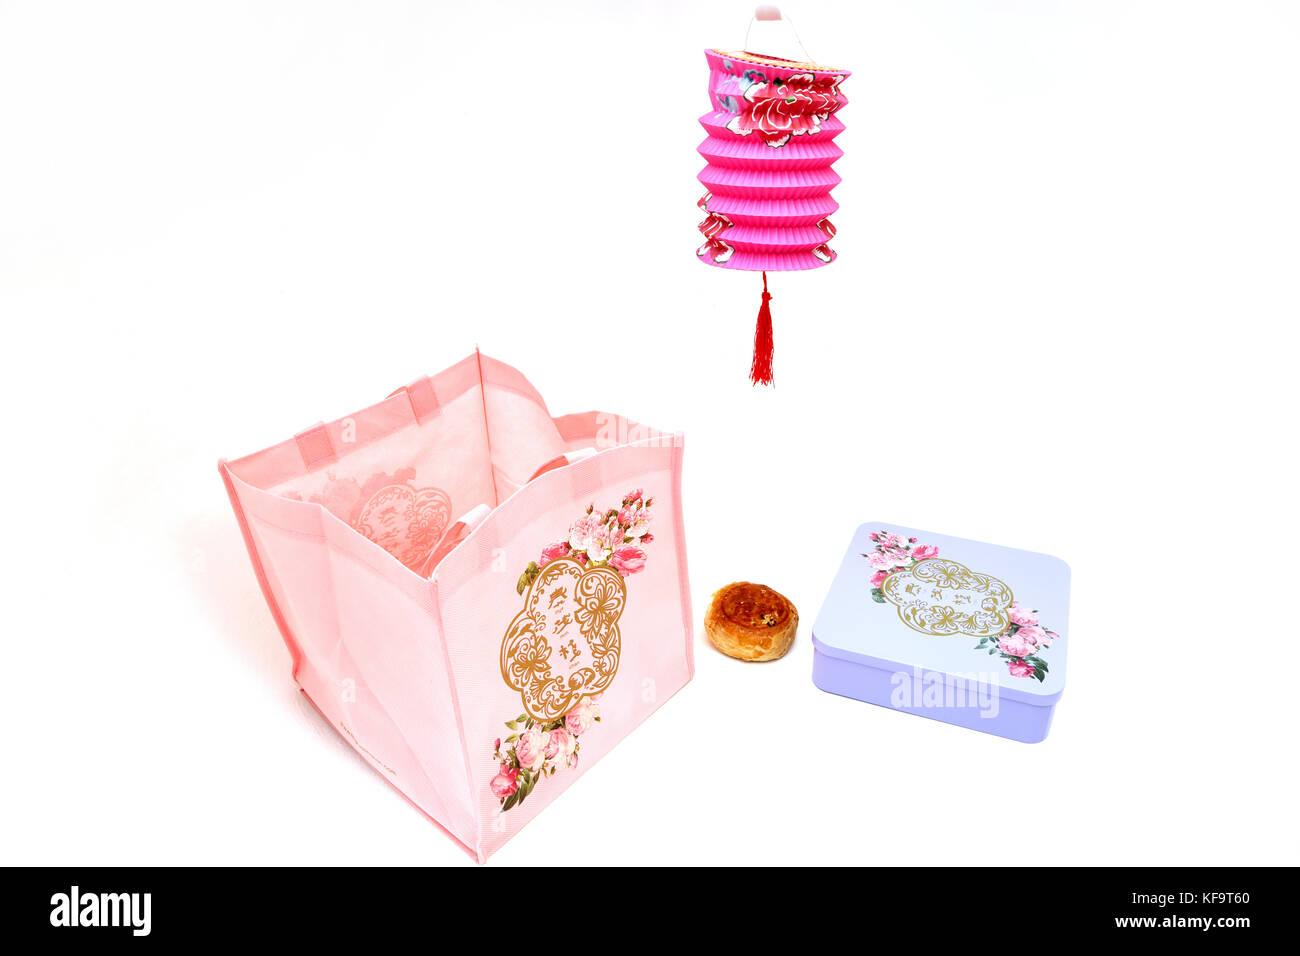 Mooncake Teochew Gift Set - Yuan Yang con yema de huevo ,de estaño Mooncakes, Thye Moh Chan Tote Bag y linterna china Foto de stock